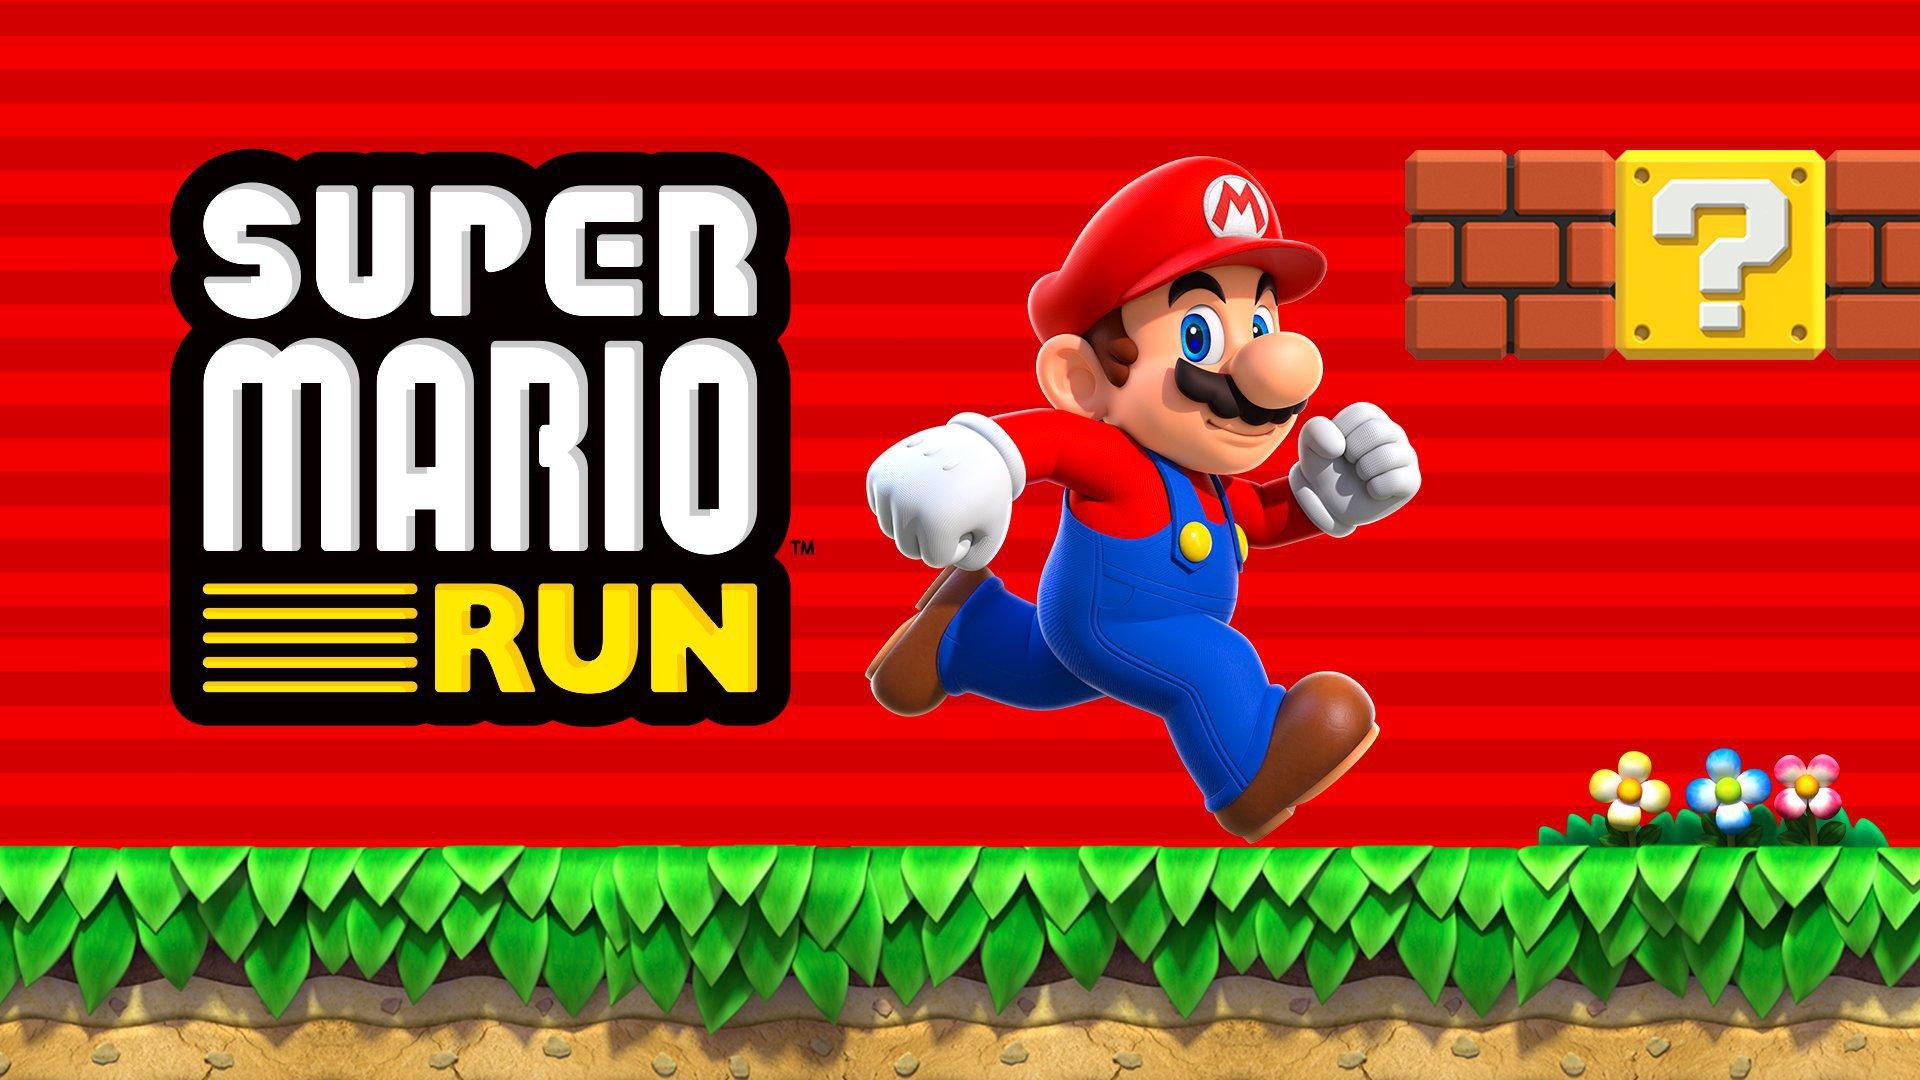 One interesting feature of Super Mario Run